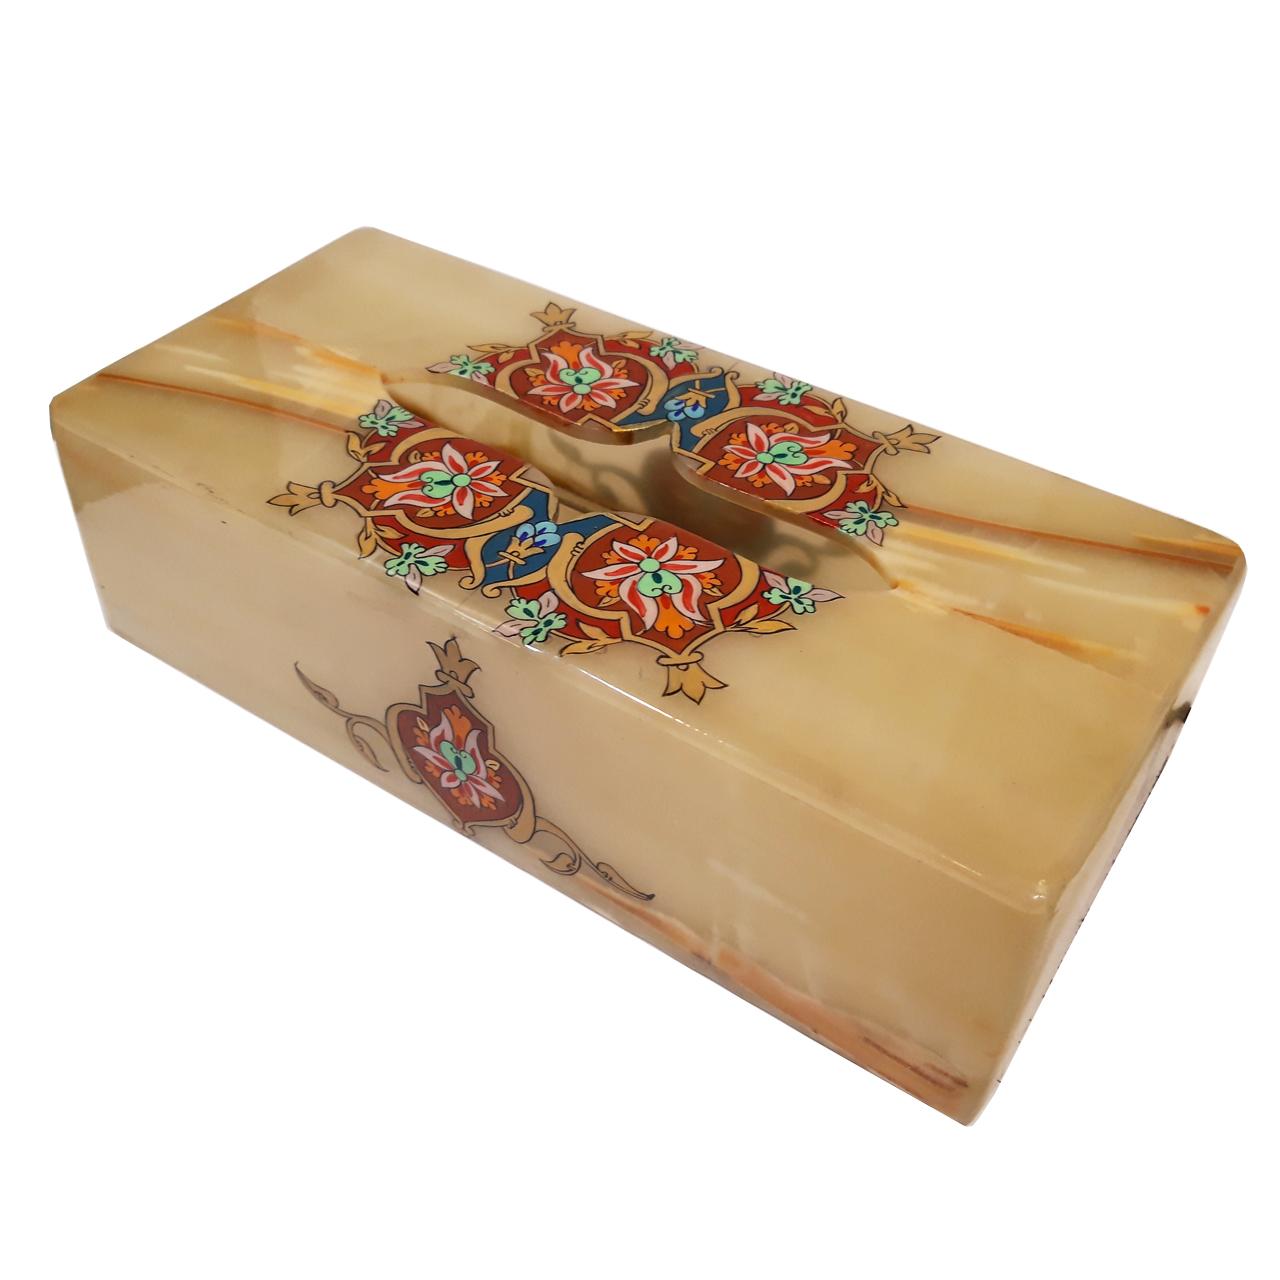 جعبه دستمال کاغذی سنگ مرمر طرح ترنج کد 2210